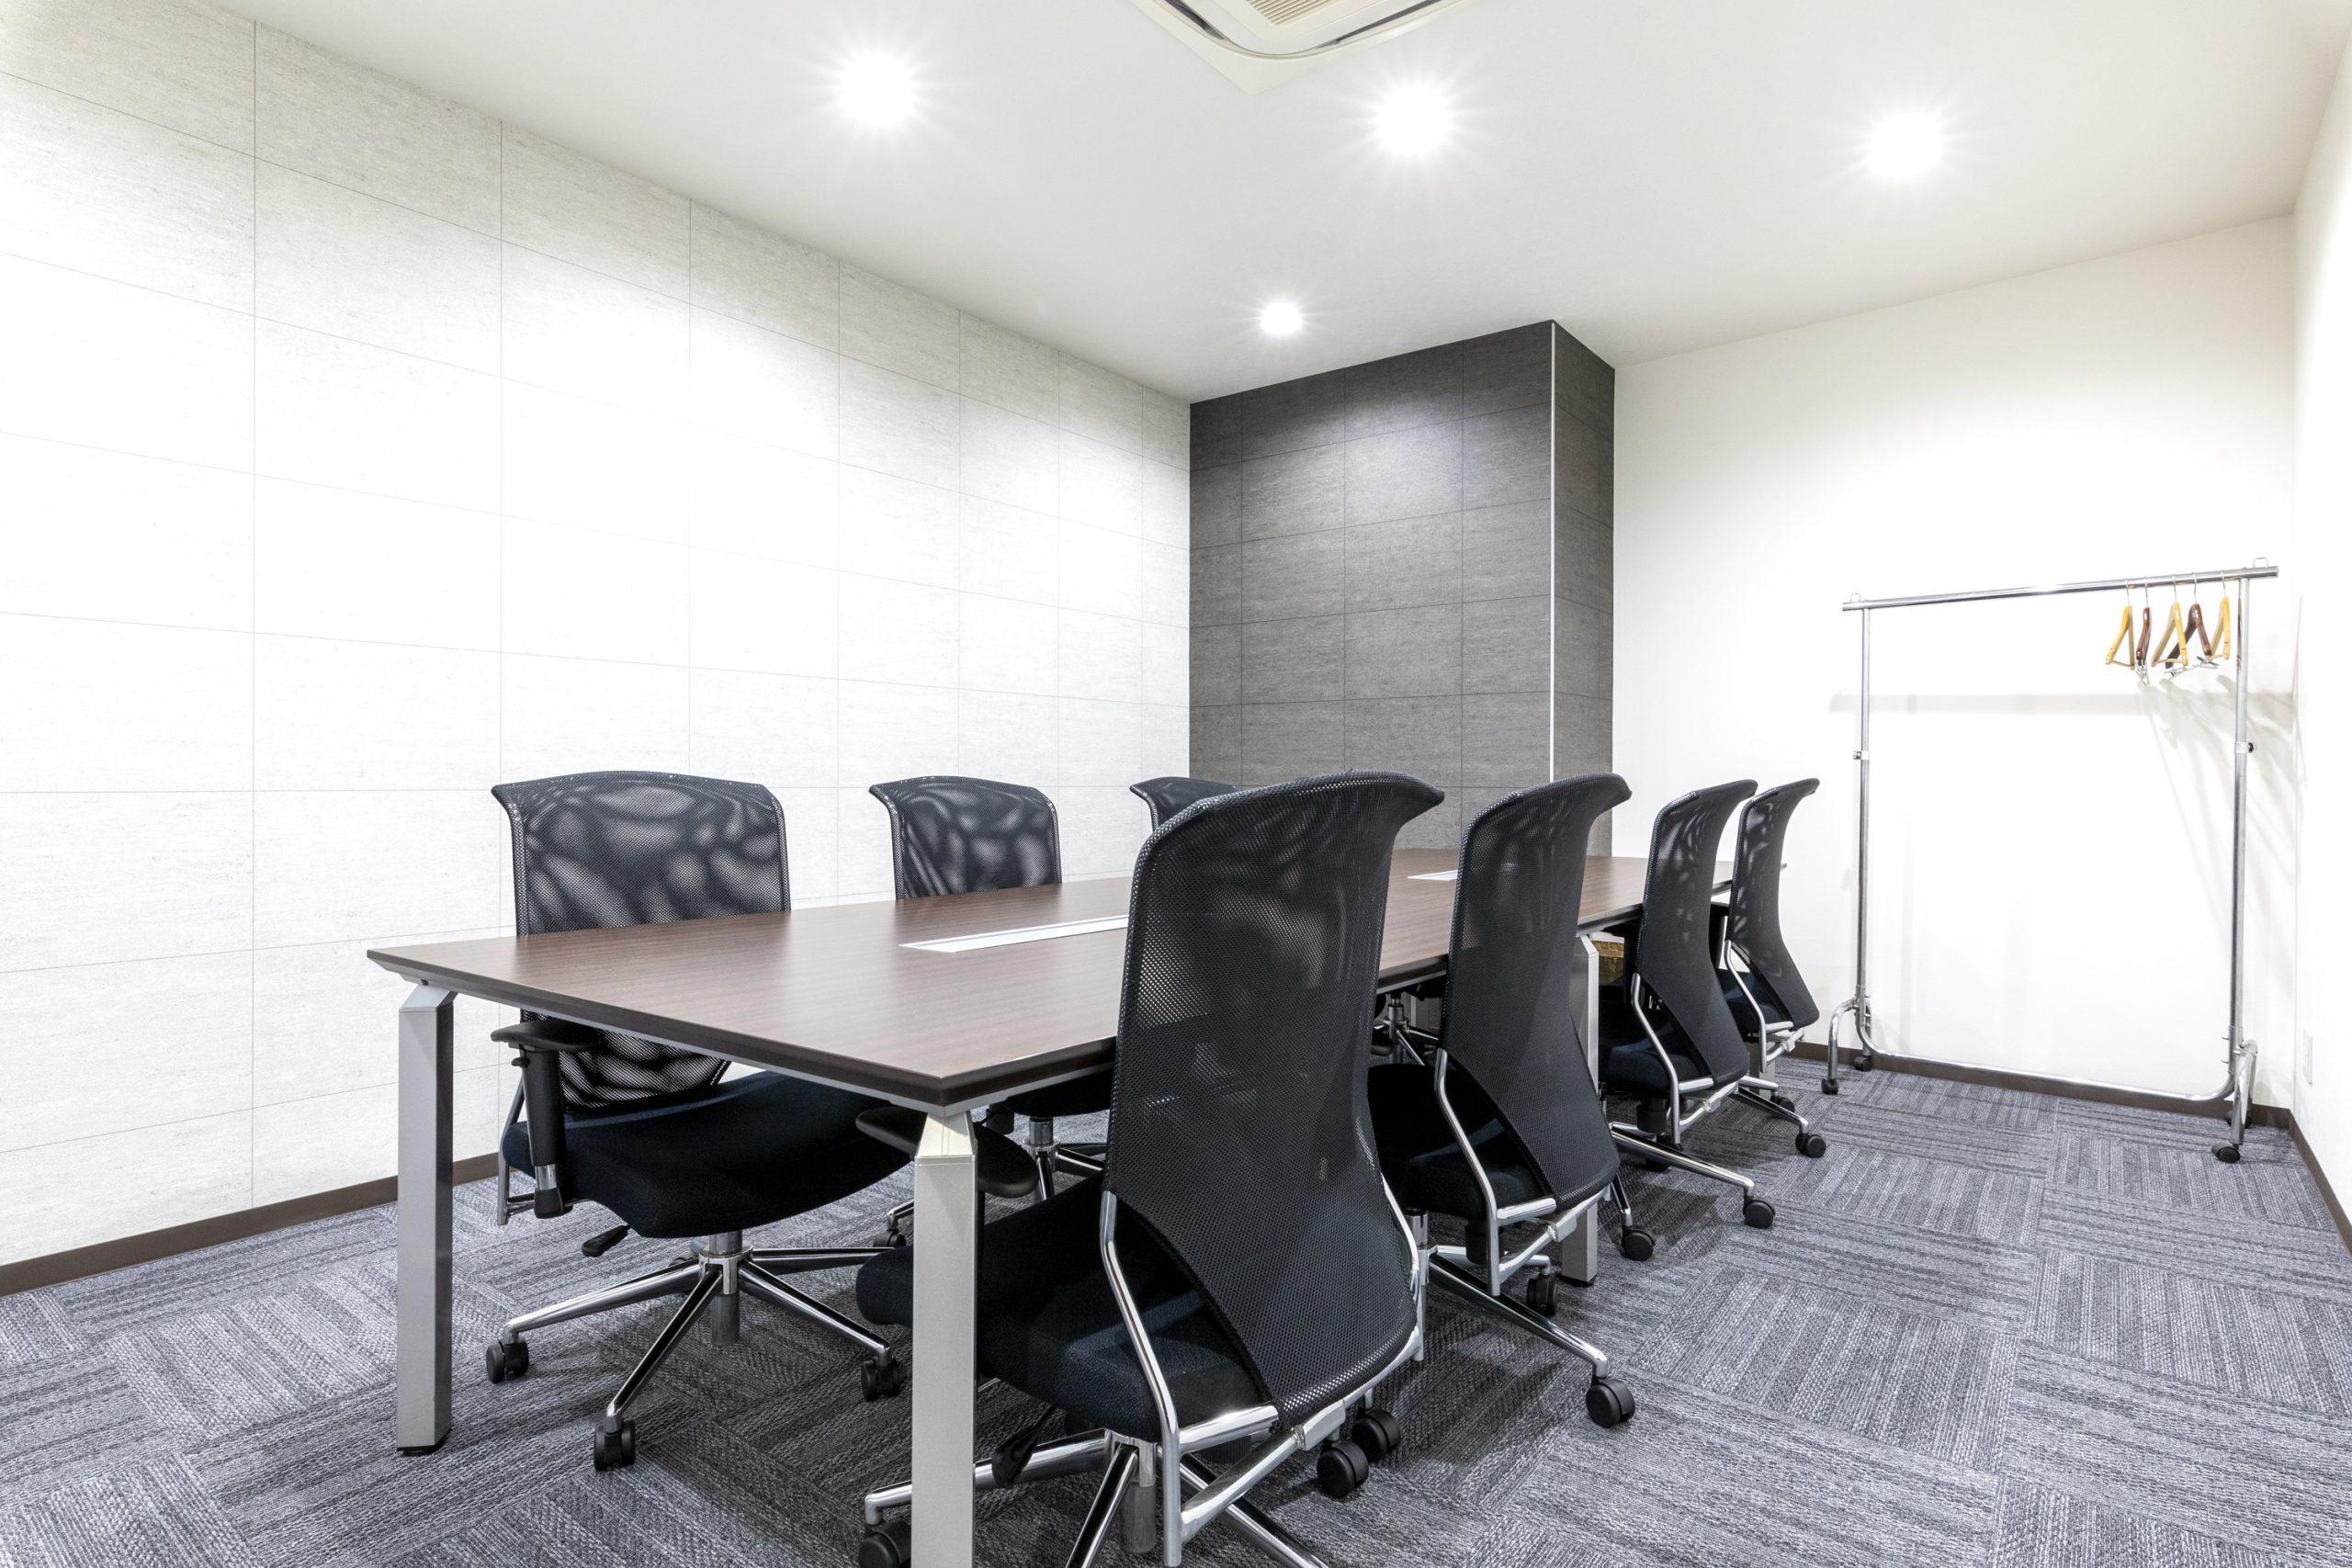 シェア会議室